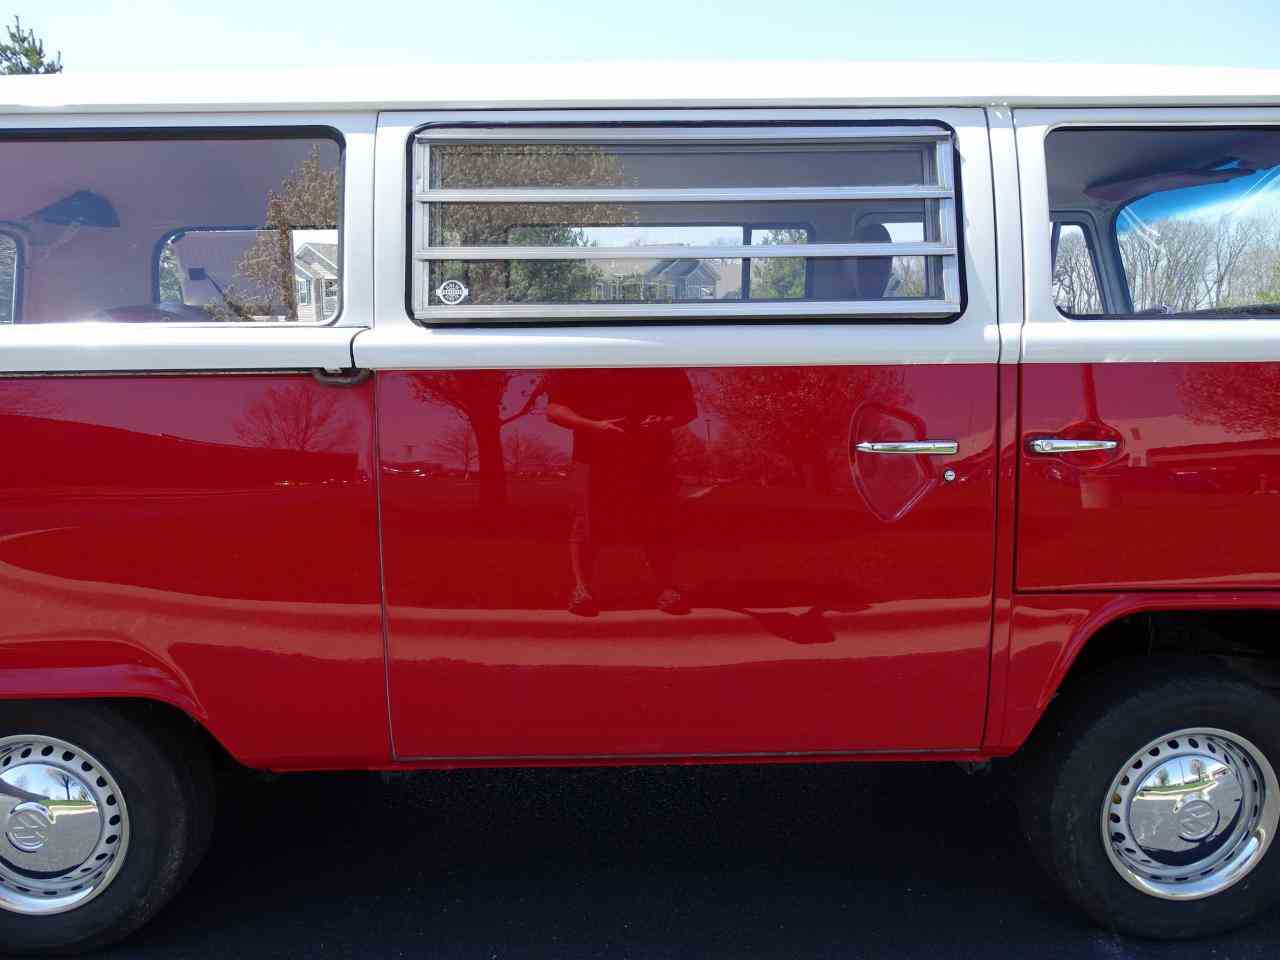 Large Picture of '74 Volkswagen Westfalia Camper located in O'Fallon Illinois - $34,995.00 - NEEL